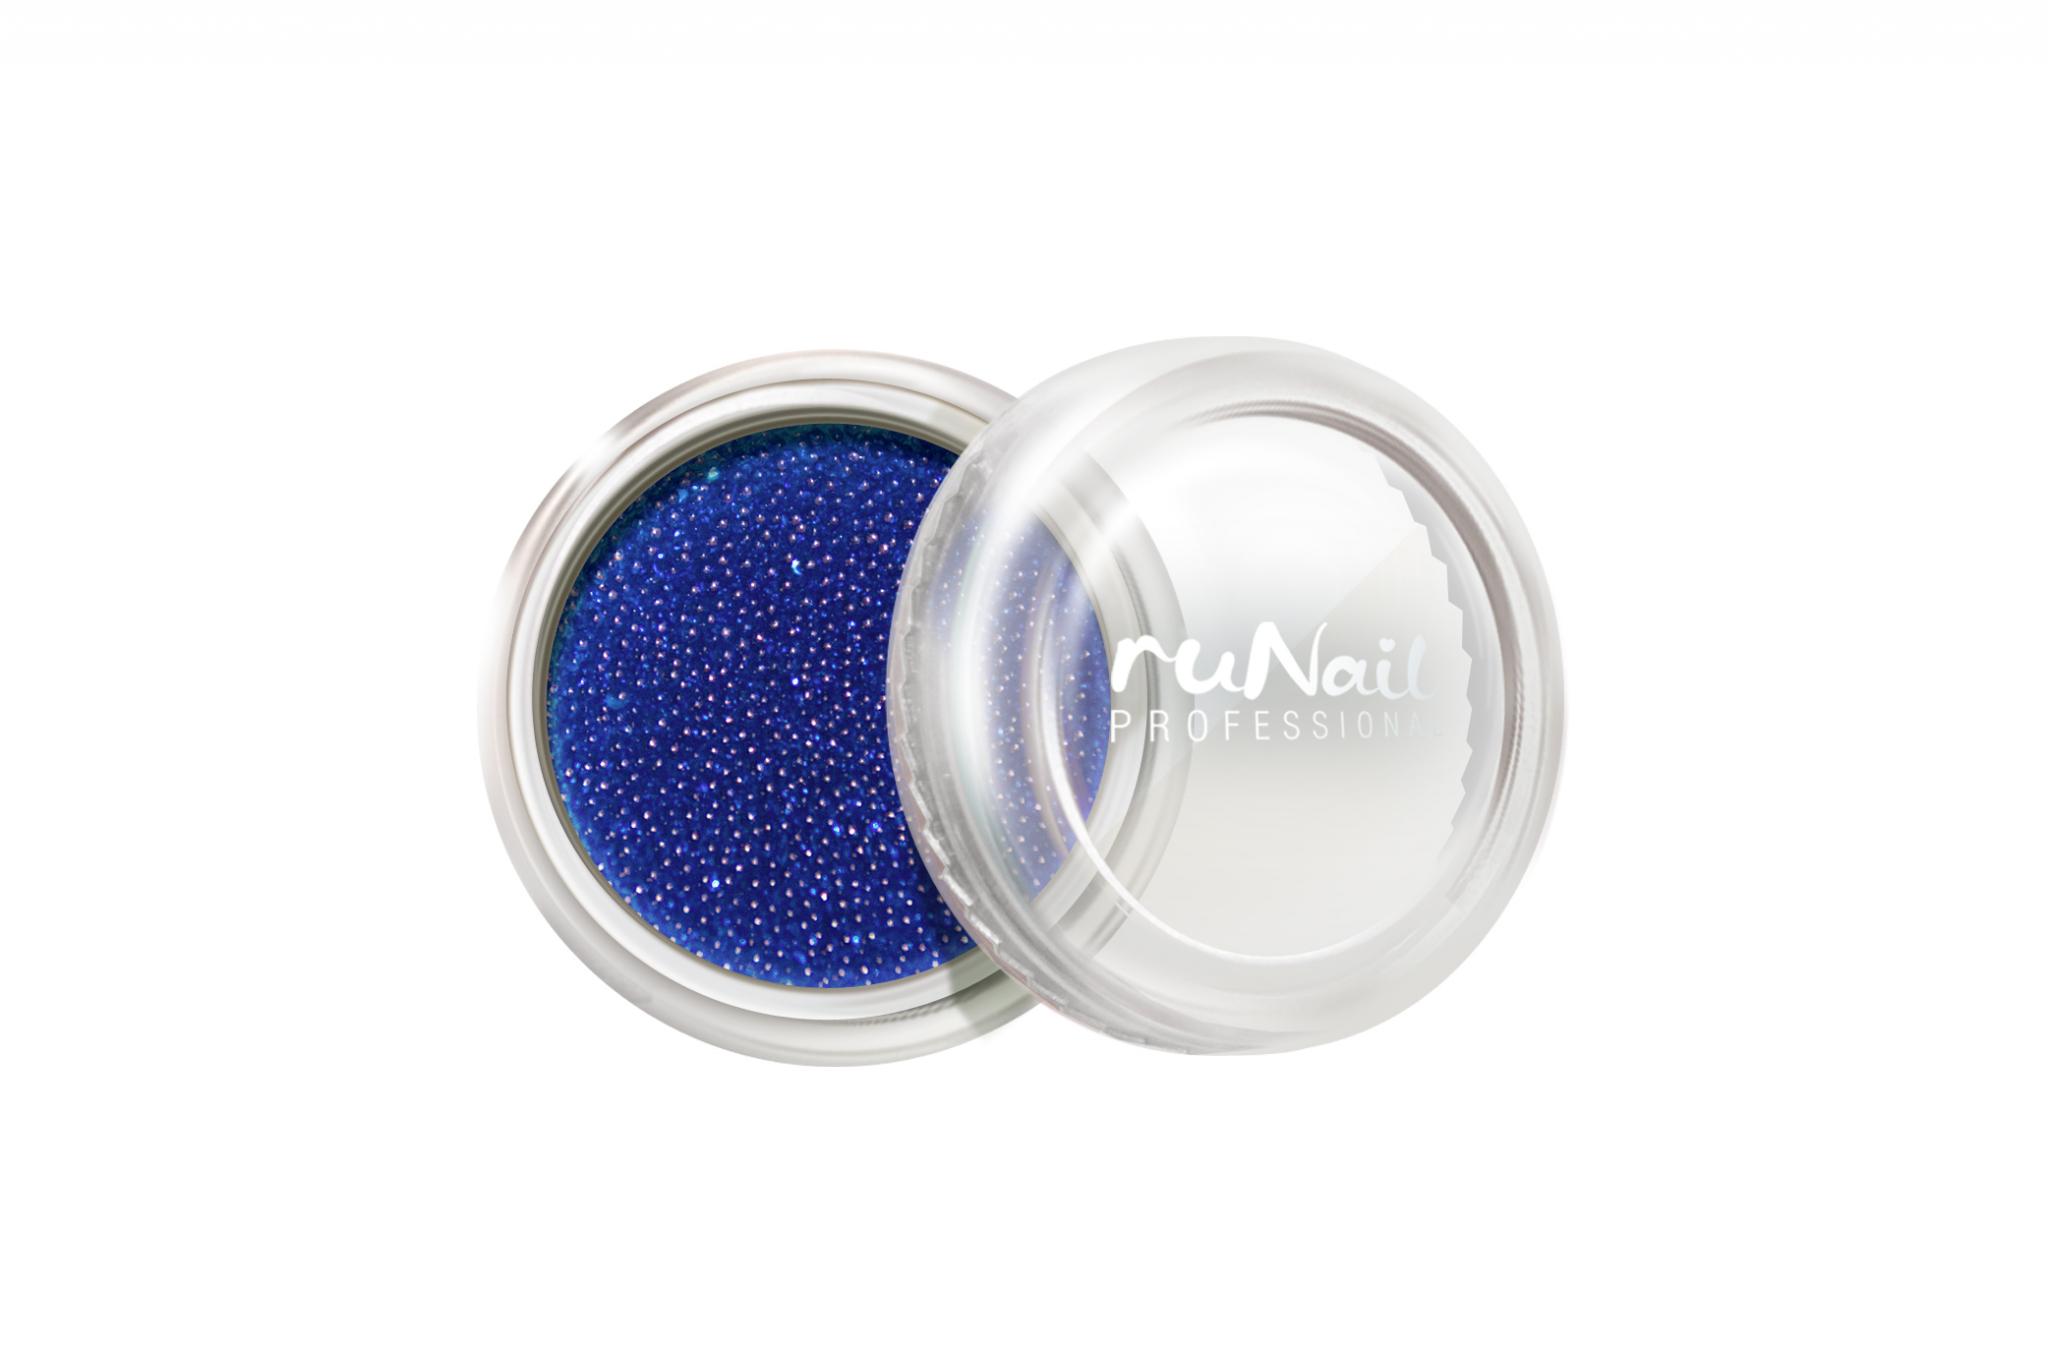 Дизайн для ногтей: бульонки (цвет: синий) № 0307